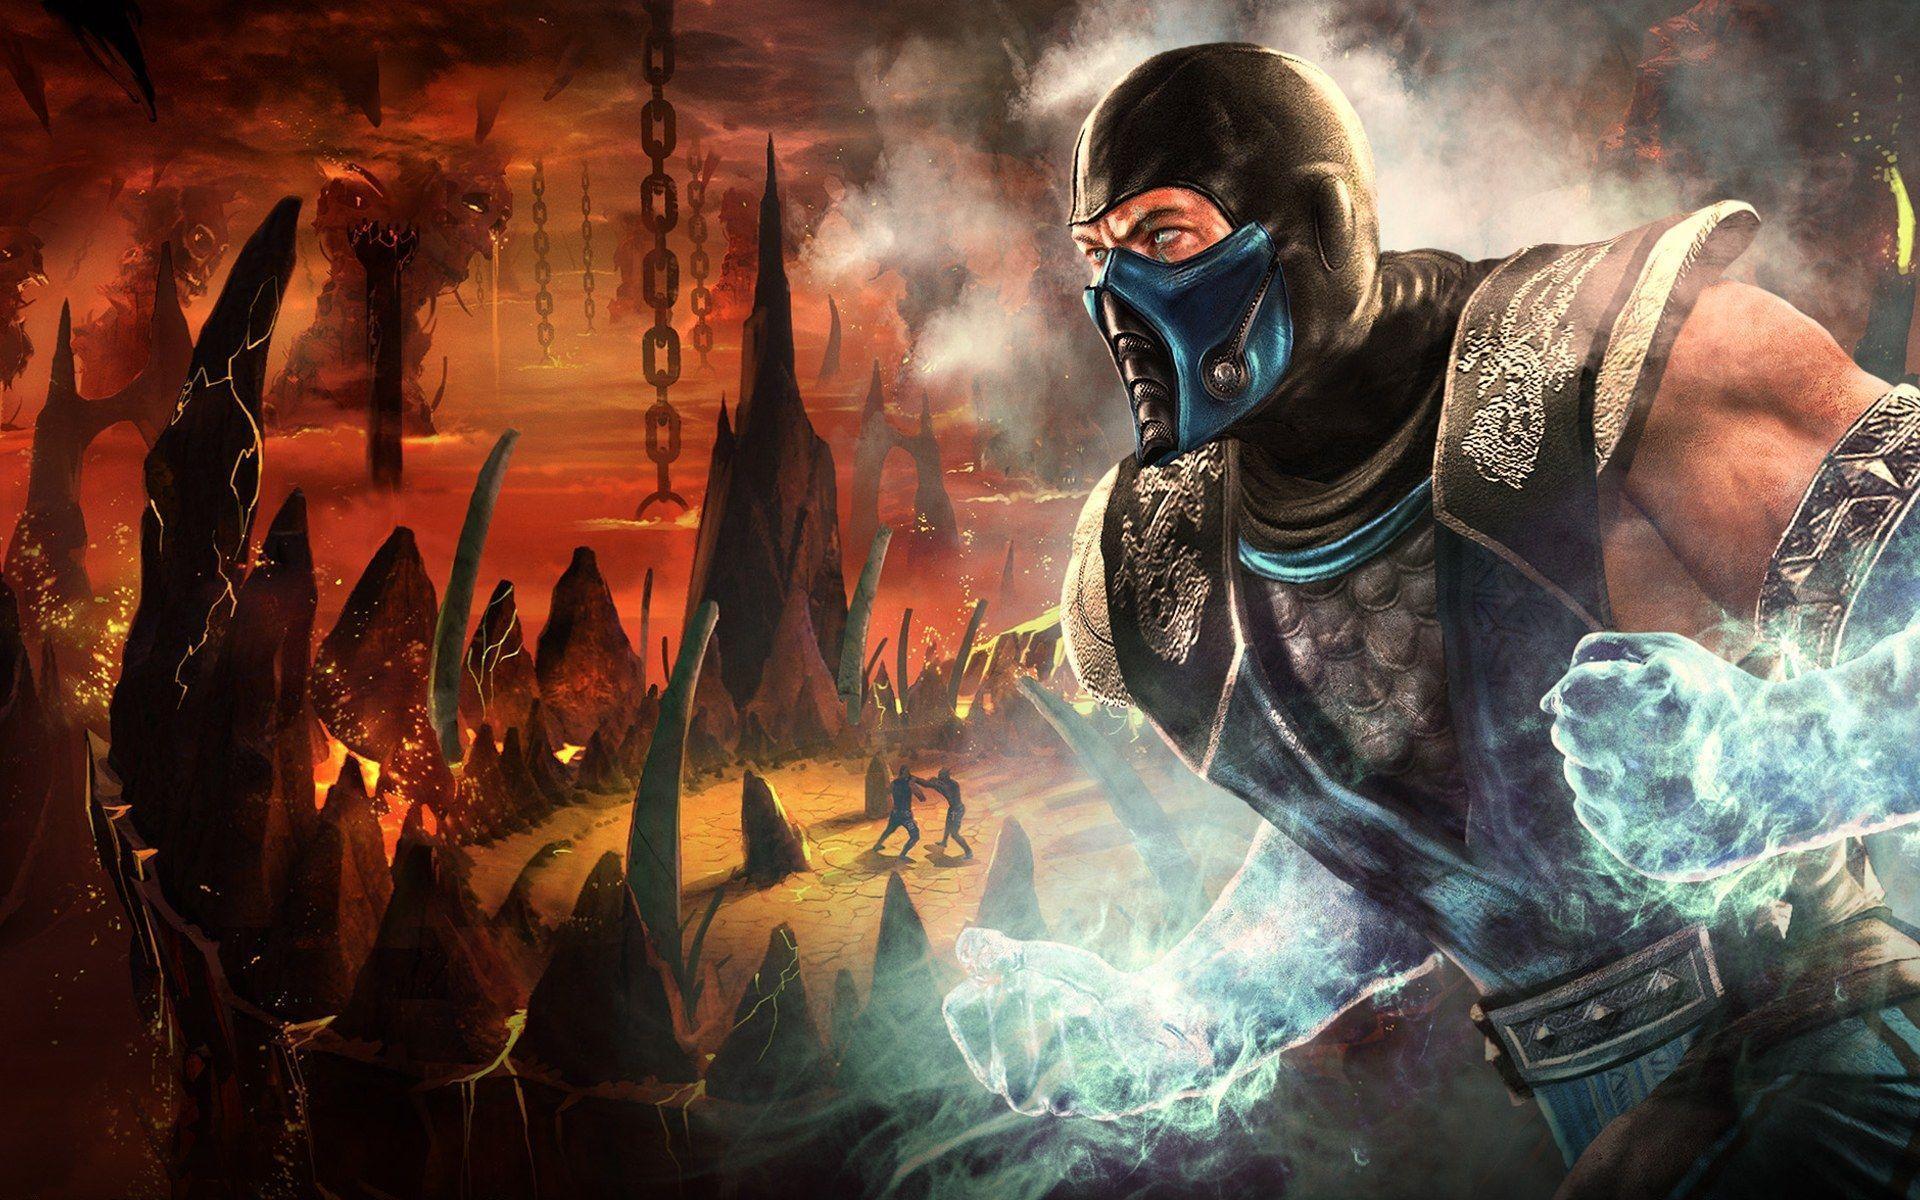 Mortal Kombat HD Wallpapers - Wallpaper Cave